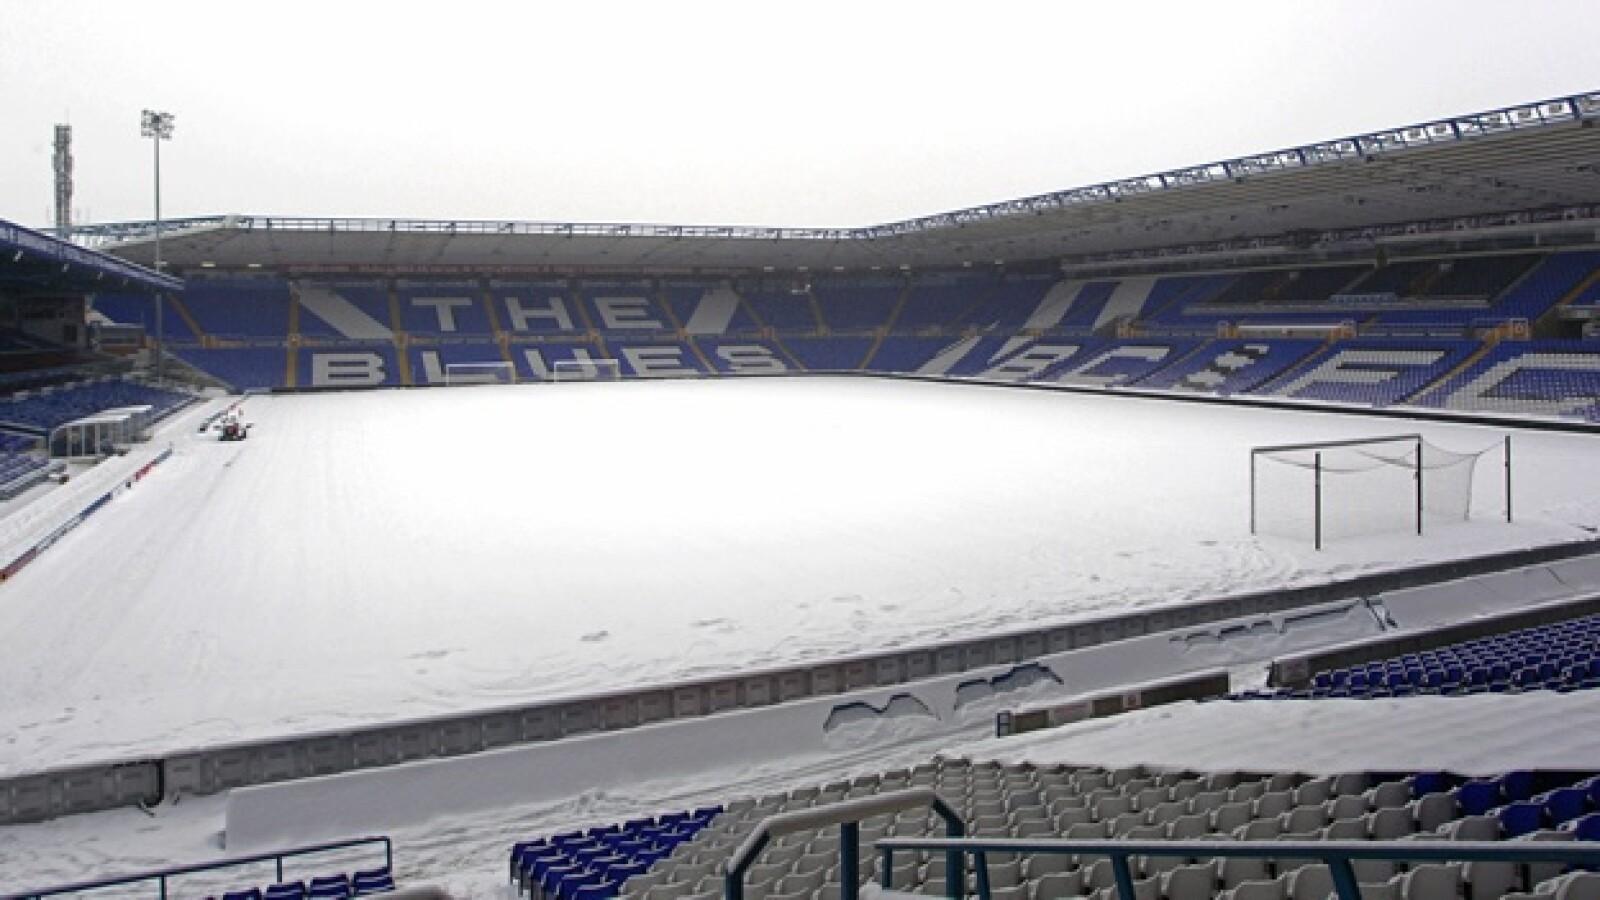 Gran Bretaña - cancha de futbol congelada